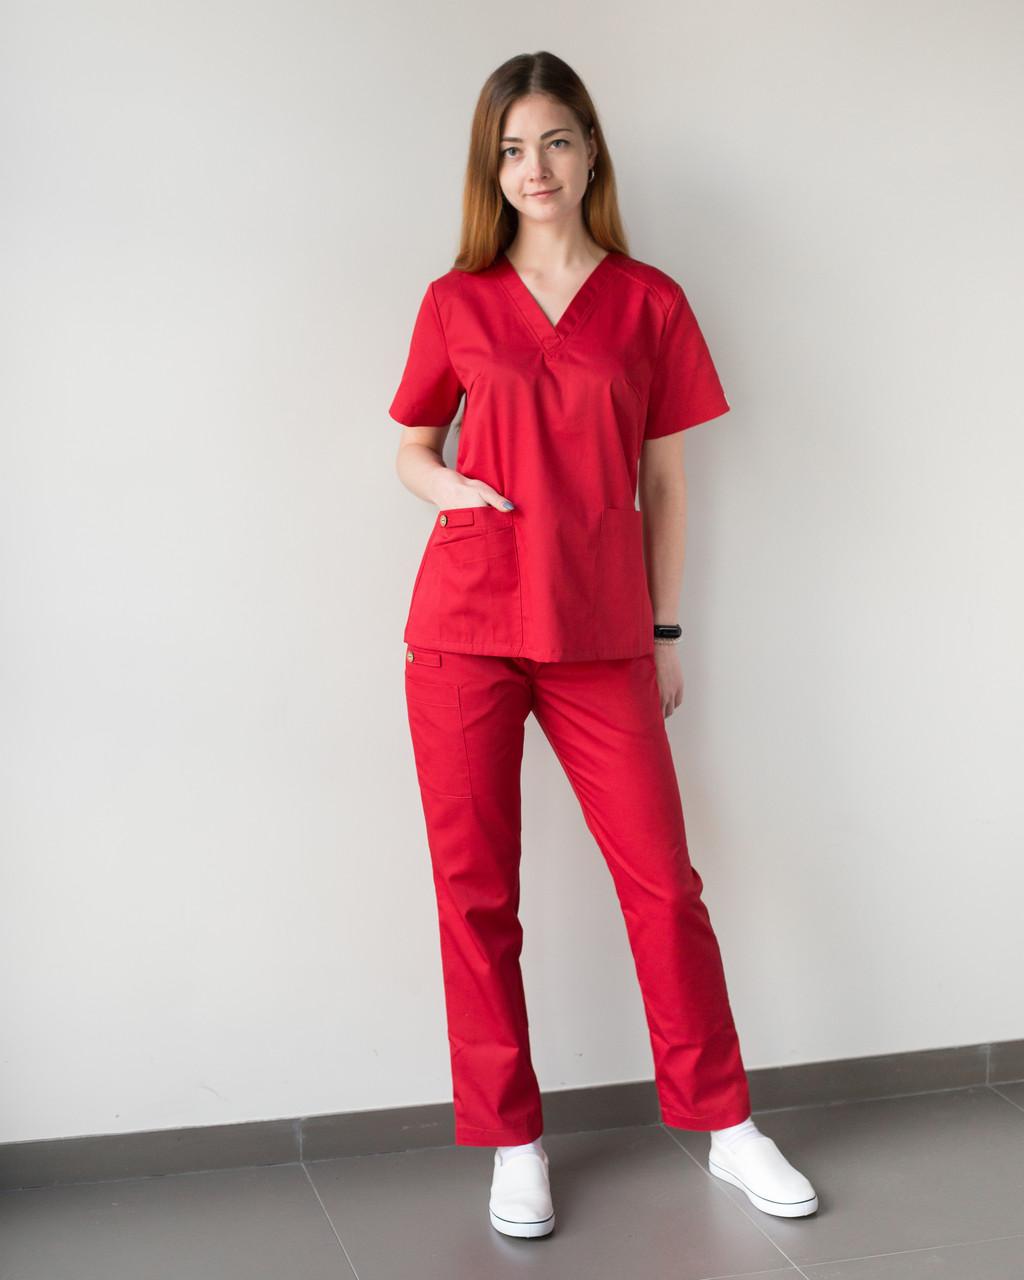 Медицинский женский костюм Toronto red